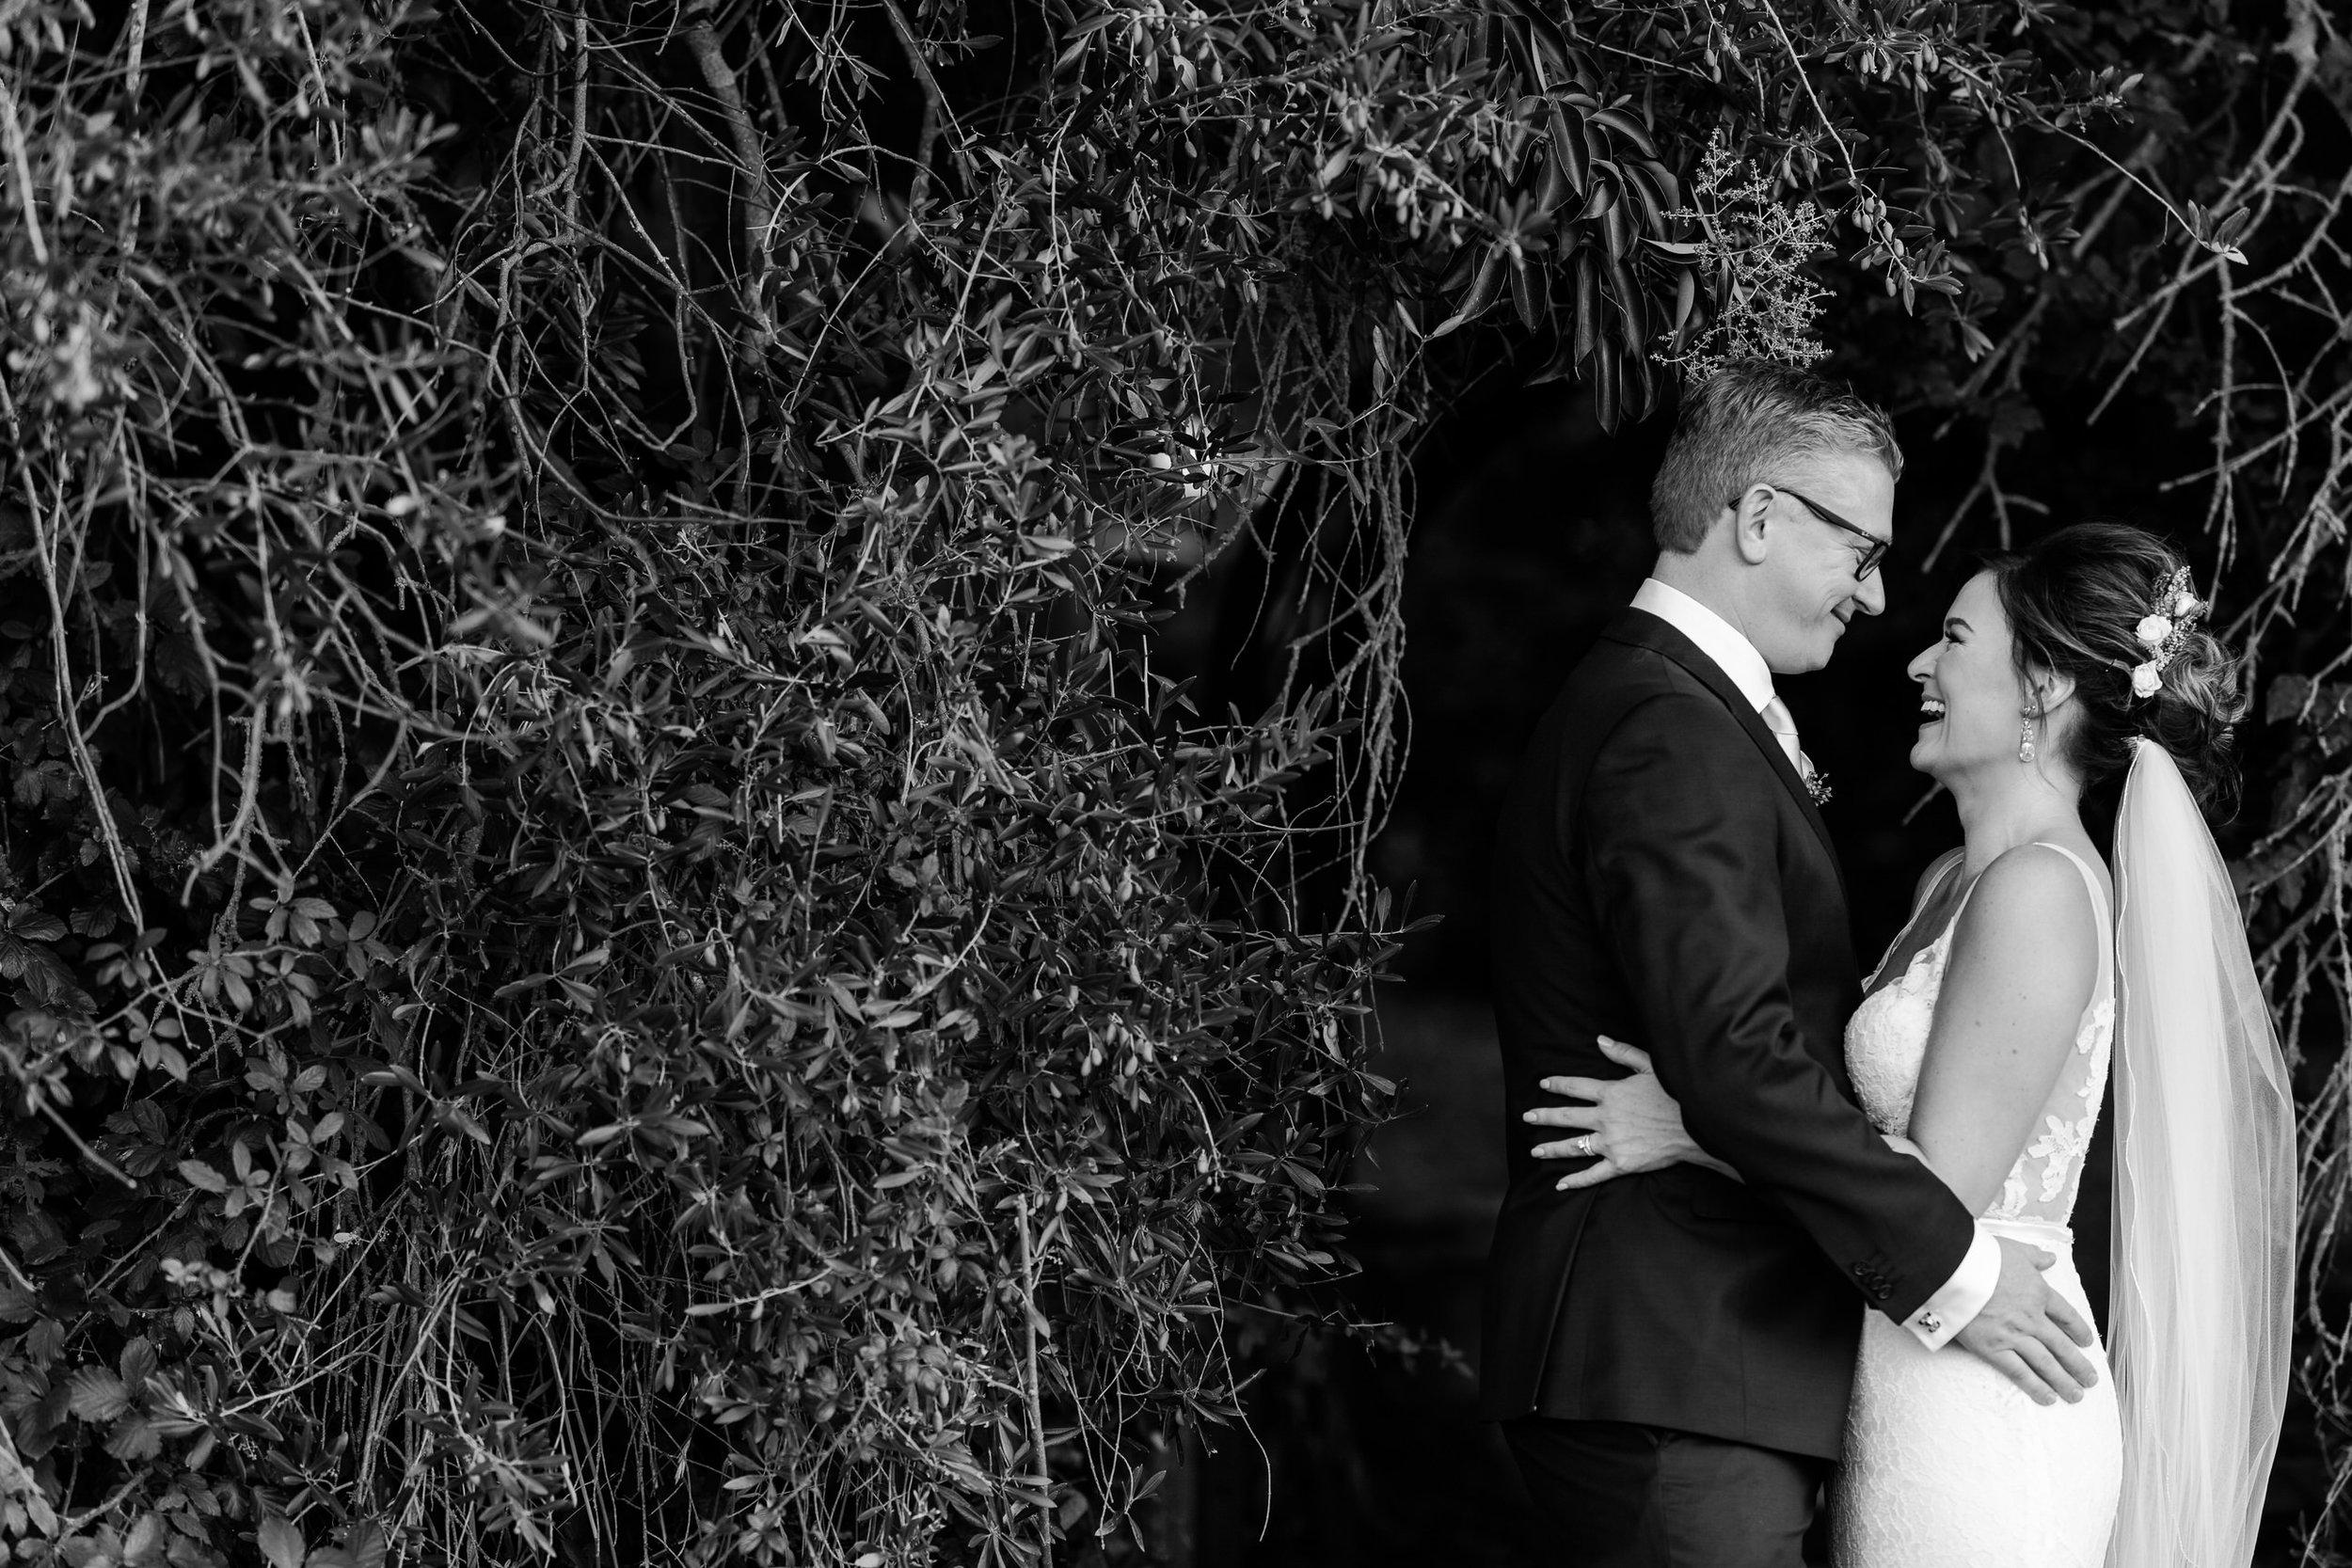 Justin_And_Jim_Photography_Chateau_Dore_Bendigo_Wedding72.JPG